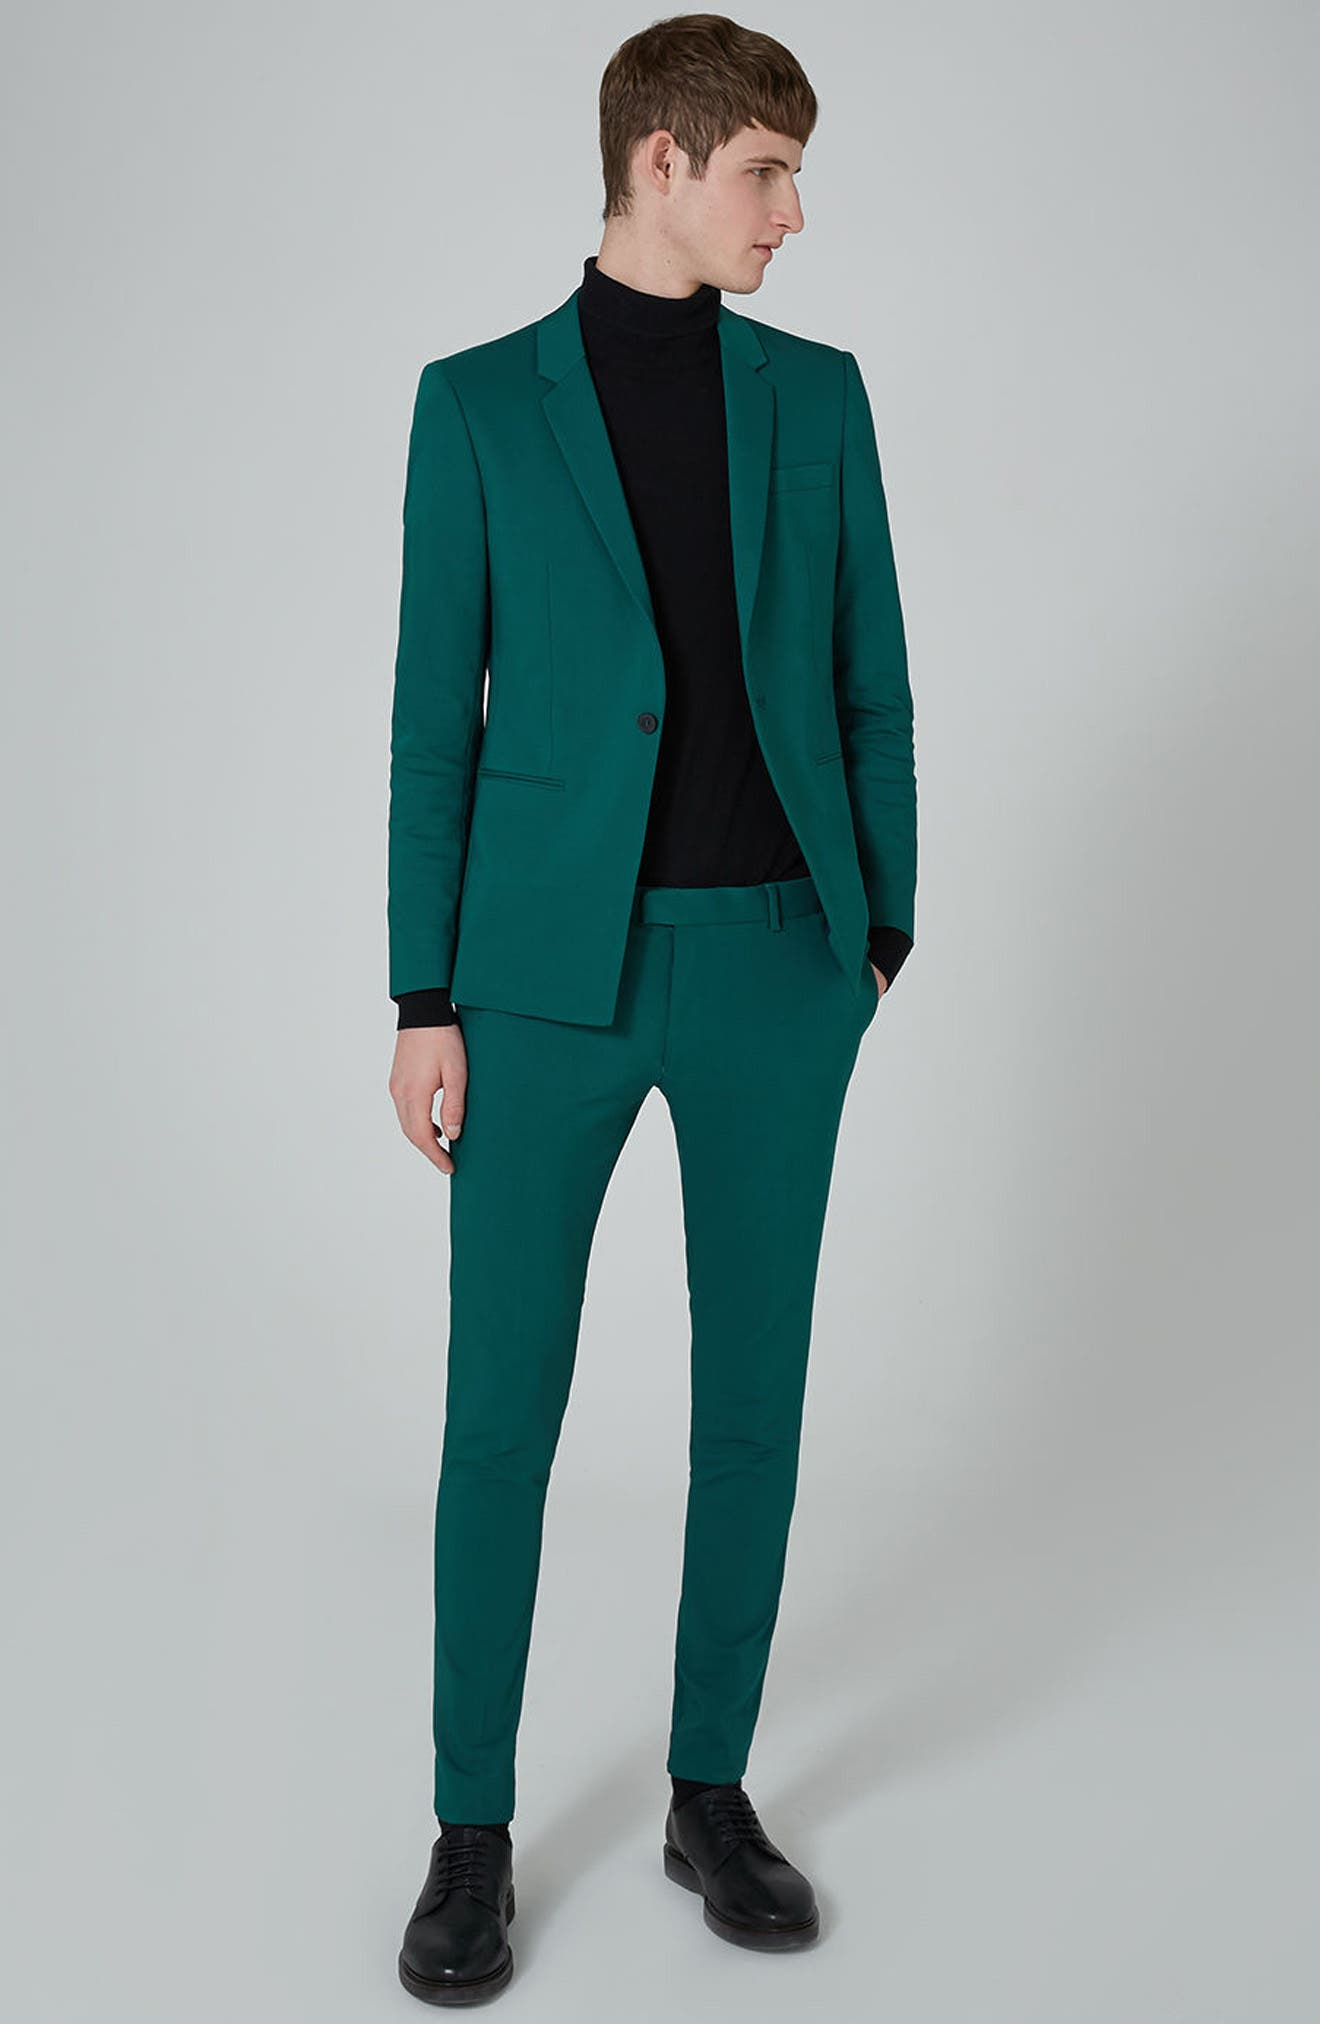 Topman Skinny Suit Jacket & Trousers